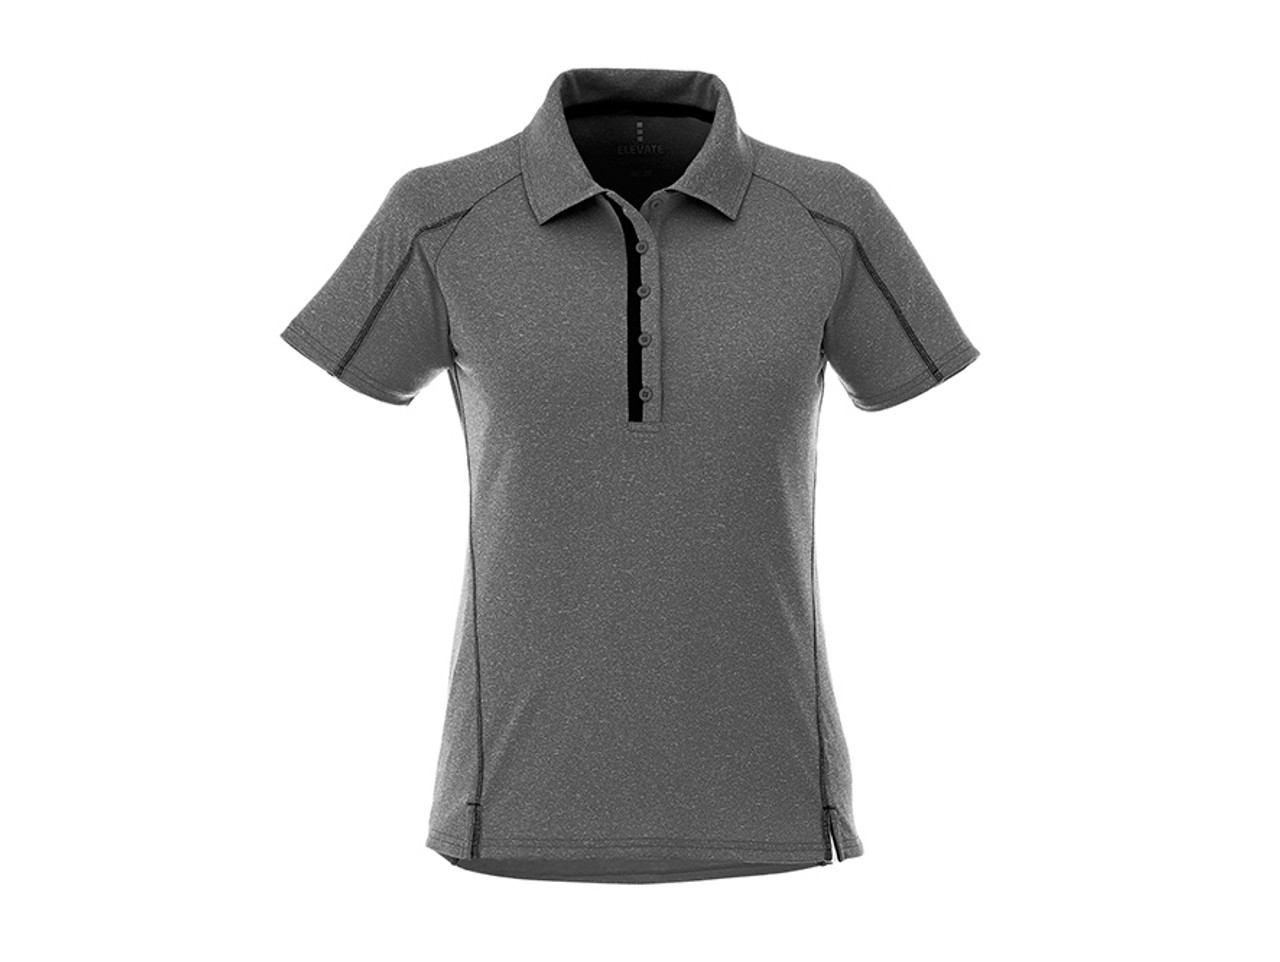 ... Heather Dark Charcoal Black Smoke Elevate 96627 Macta Women s Short  Sleeve Polo Shirt ... aabda89971